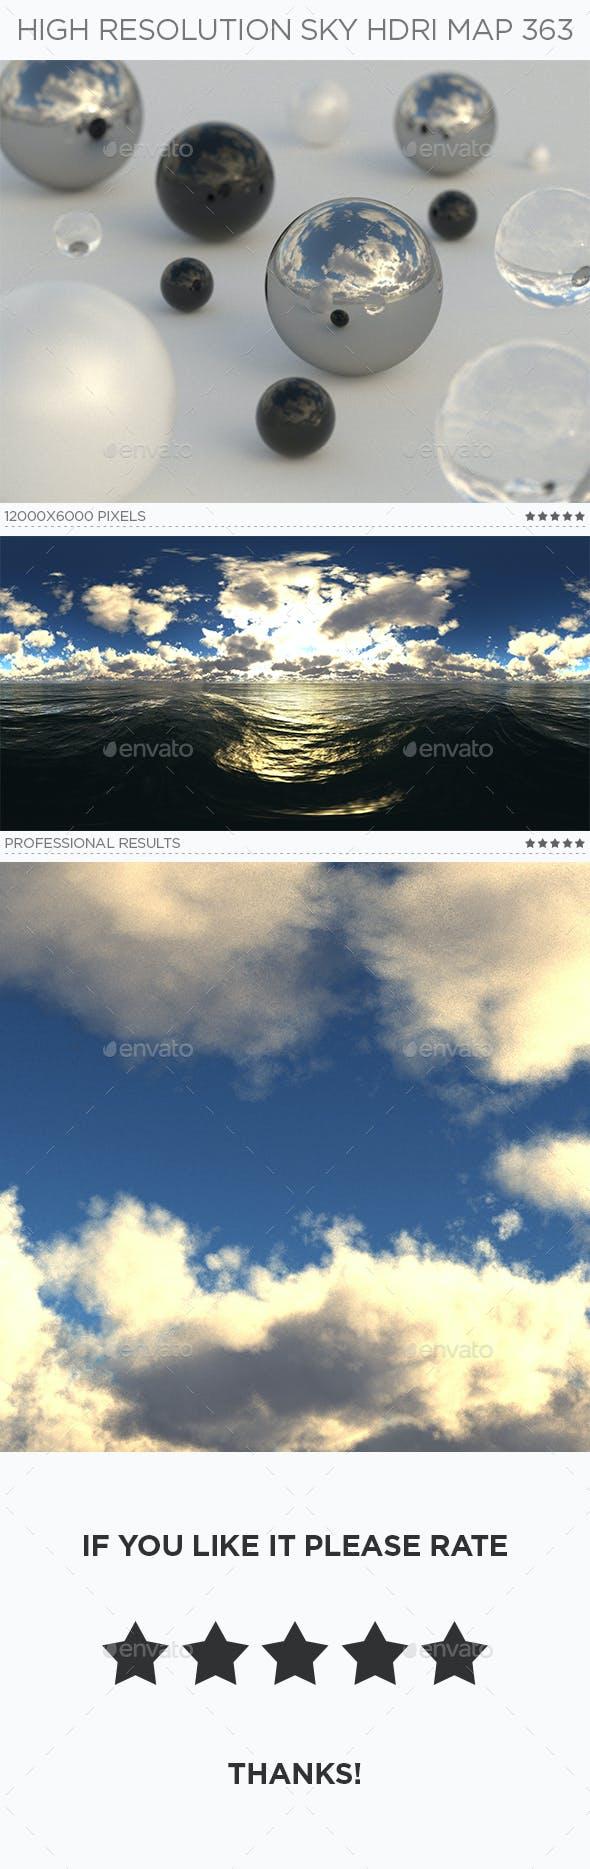 High Resolution Sky HDRi Map 363 - 3DOcean Item for Sale